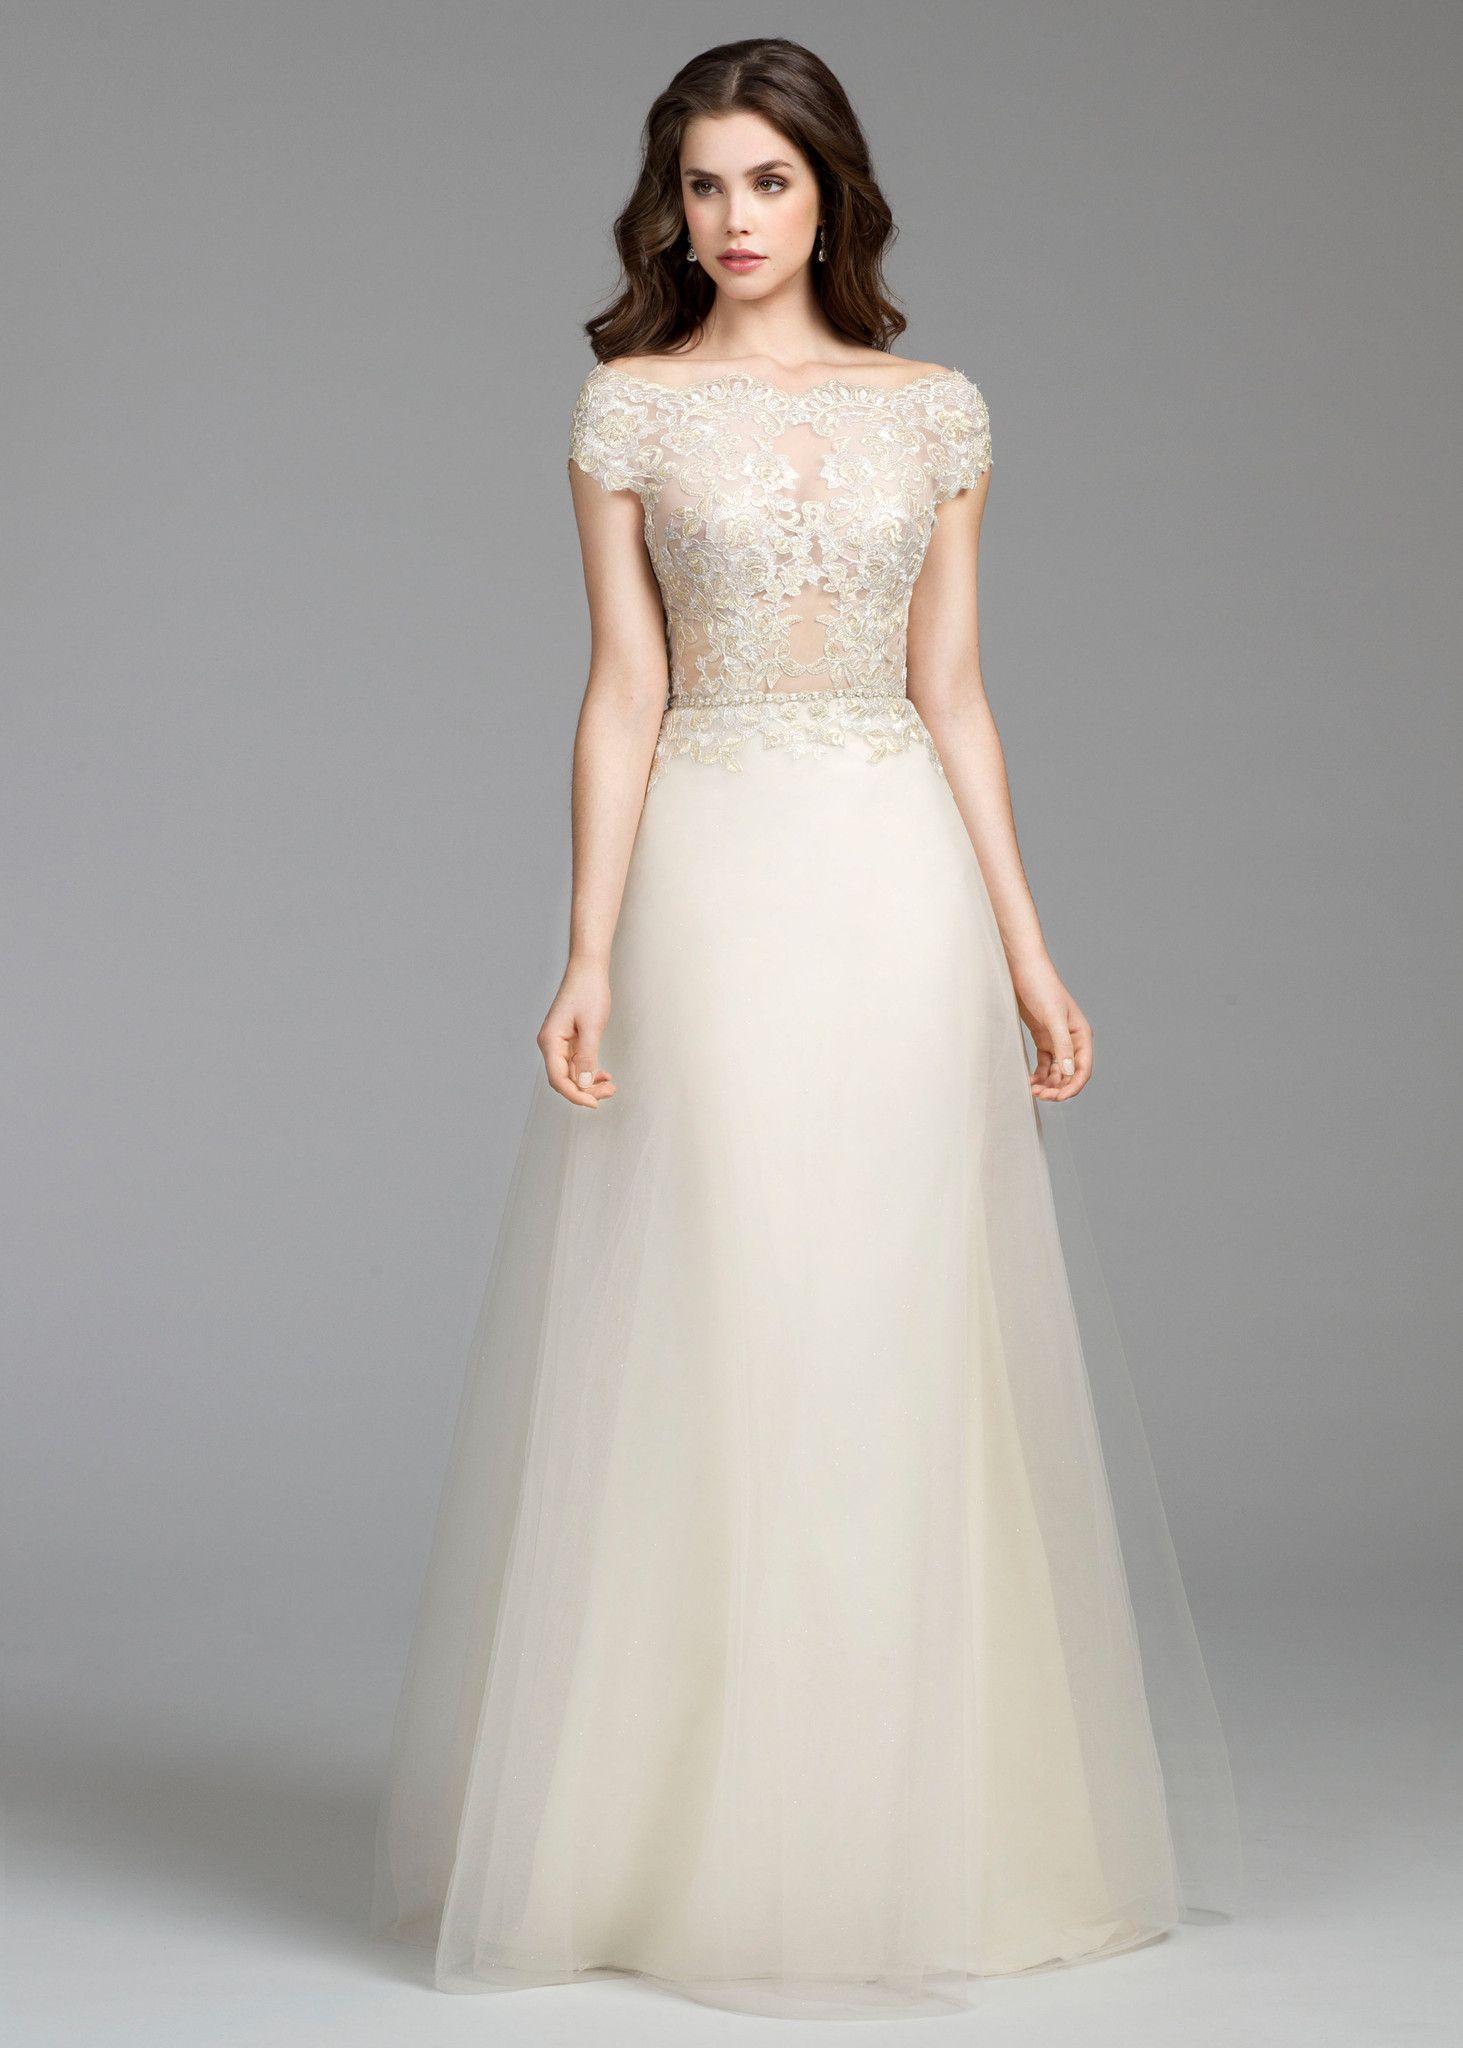 Bateau Lace Wedding Dress Tara Keely